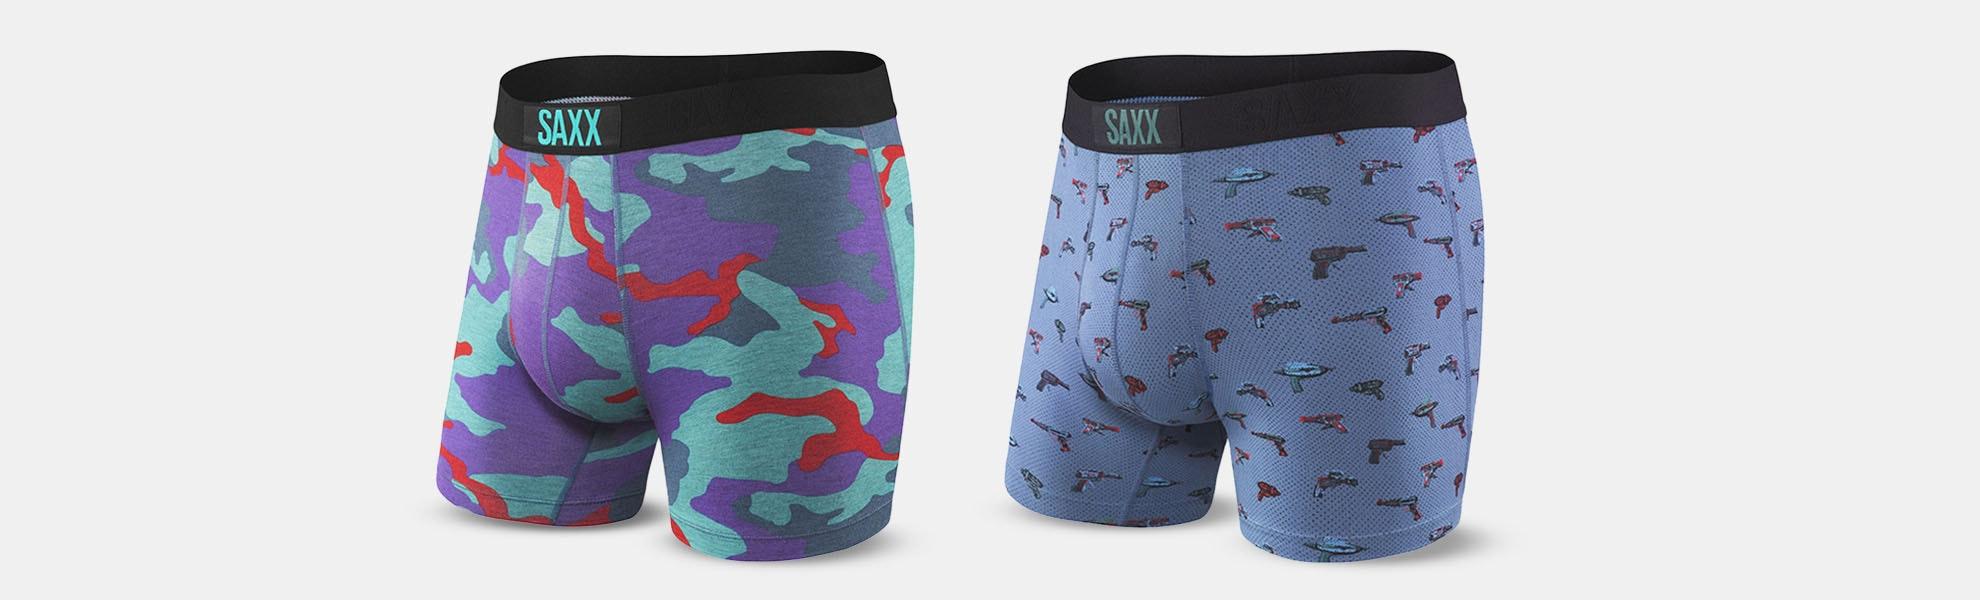 SAXX Vibe Boxer Briefs (2-Pack)